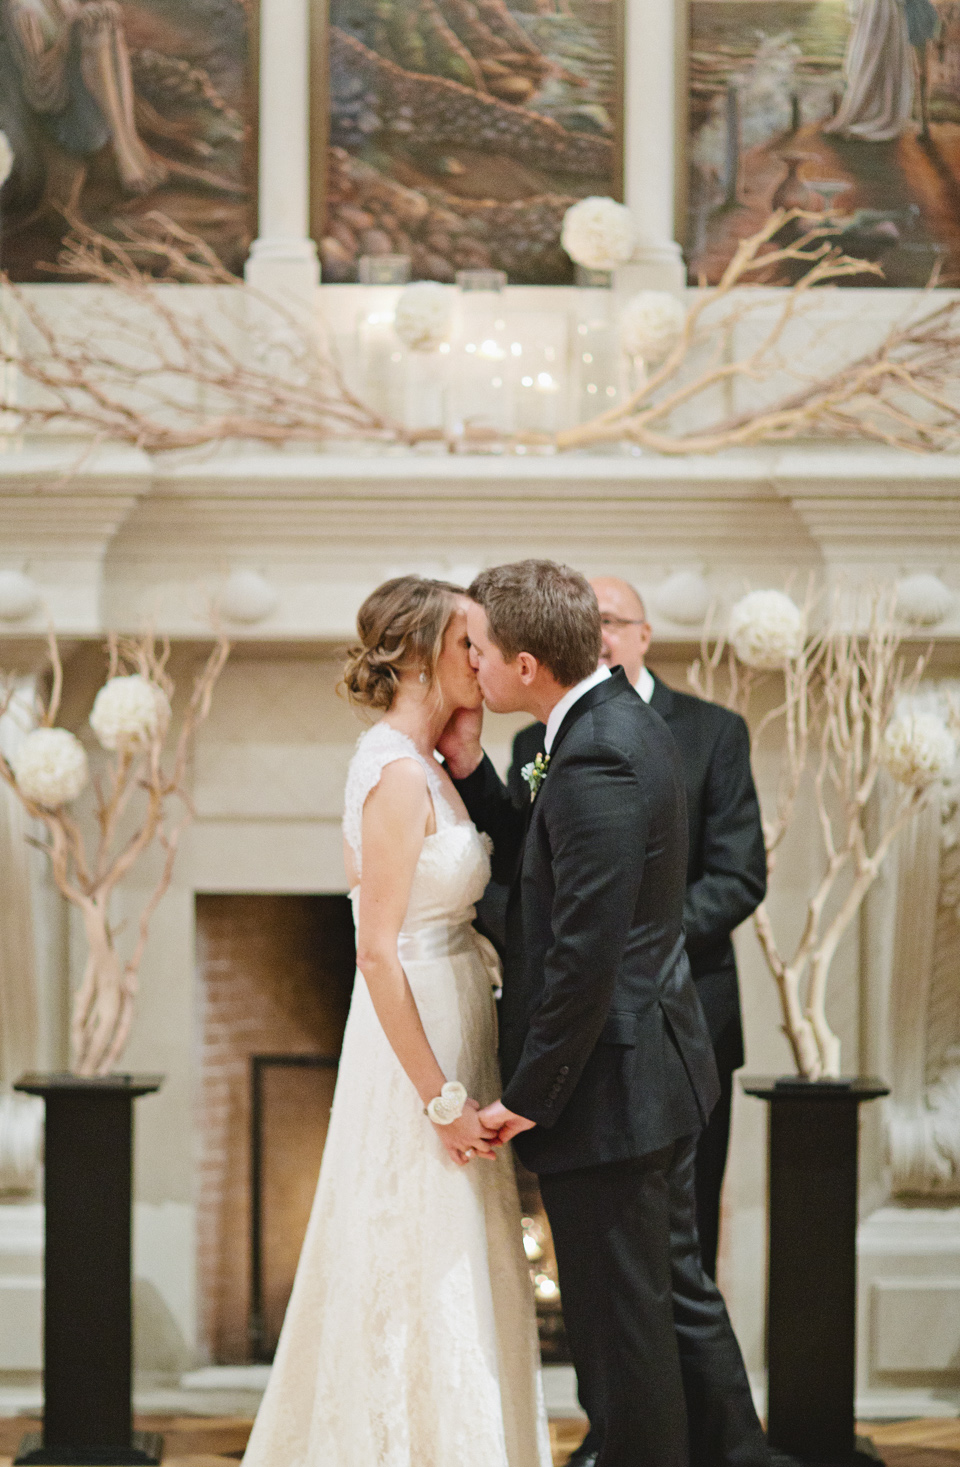 Ryan + Kaitlin La Hacienda Wedding_119.jpg